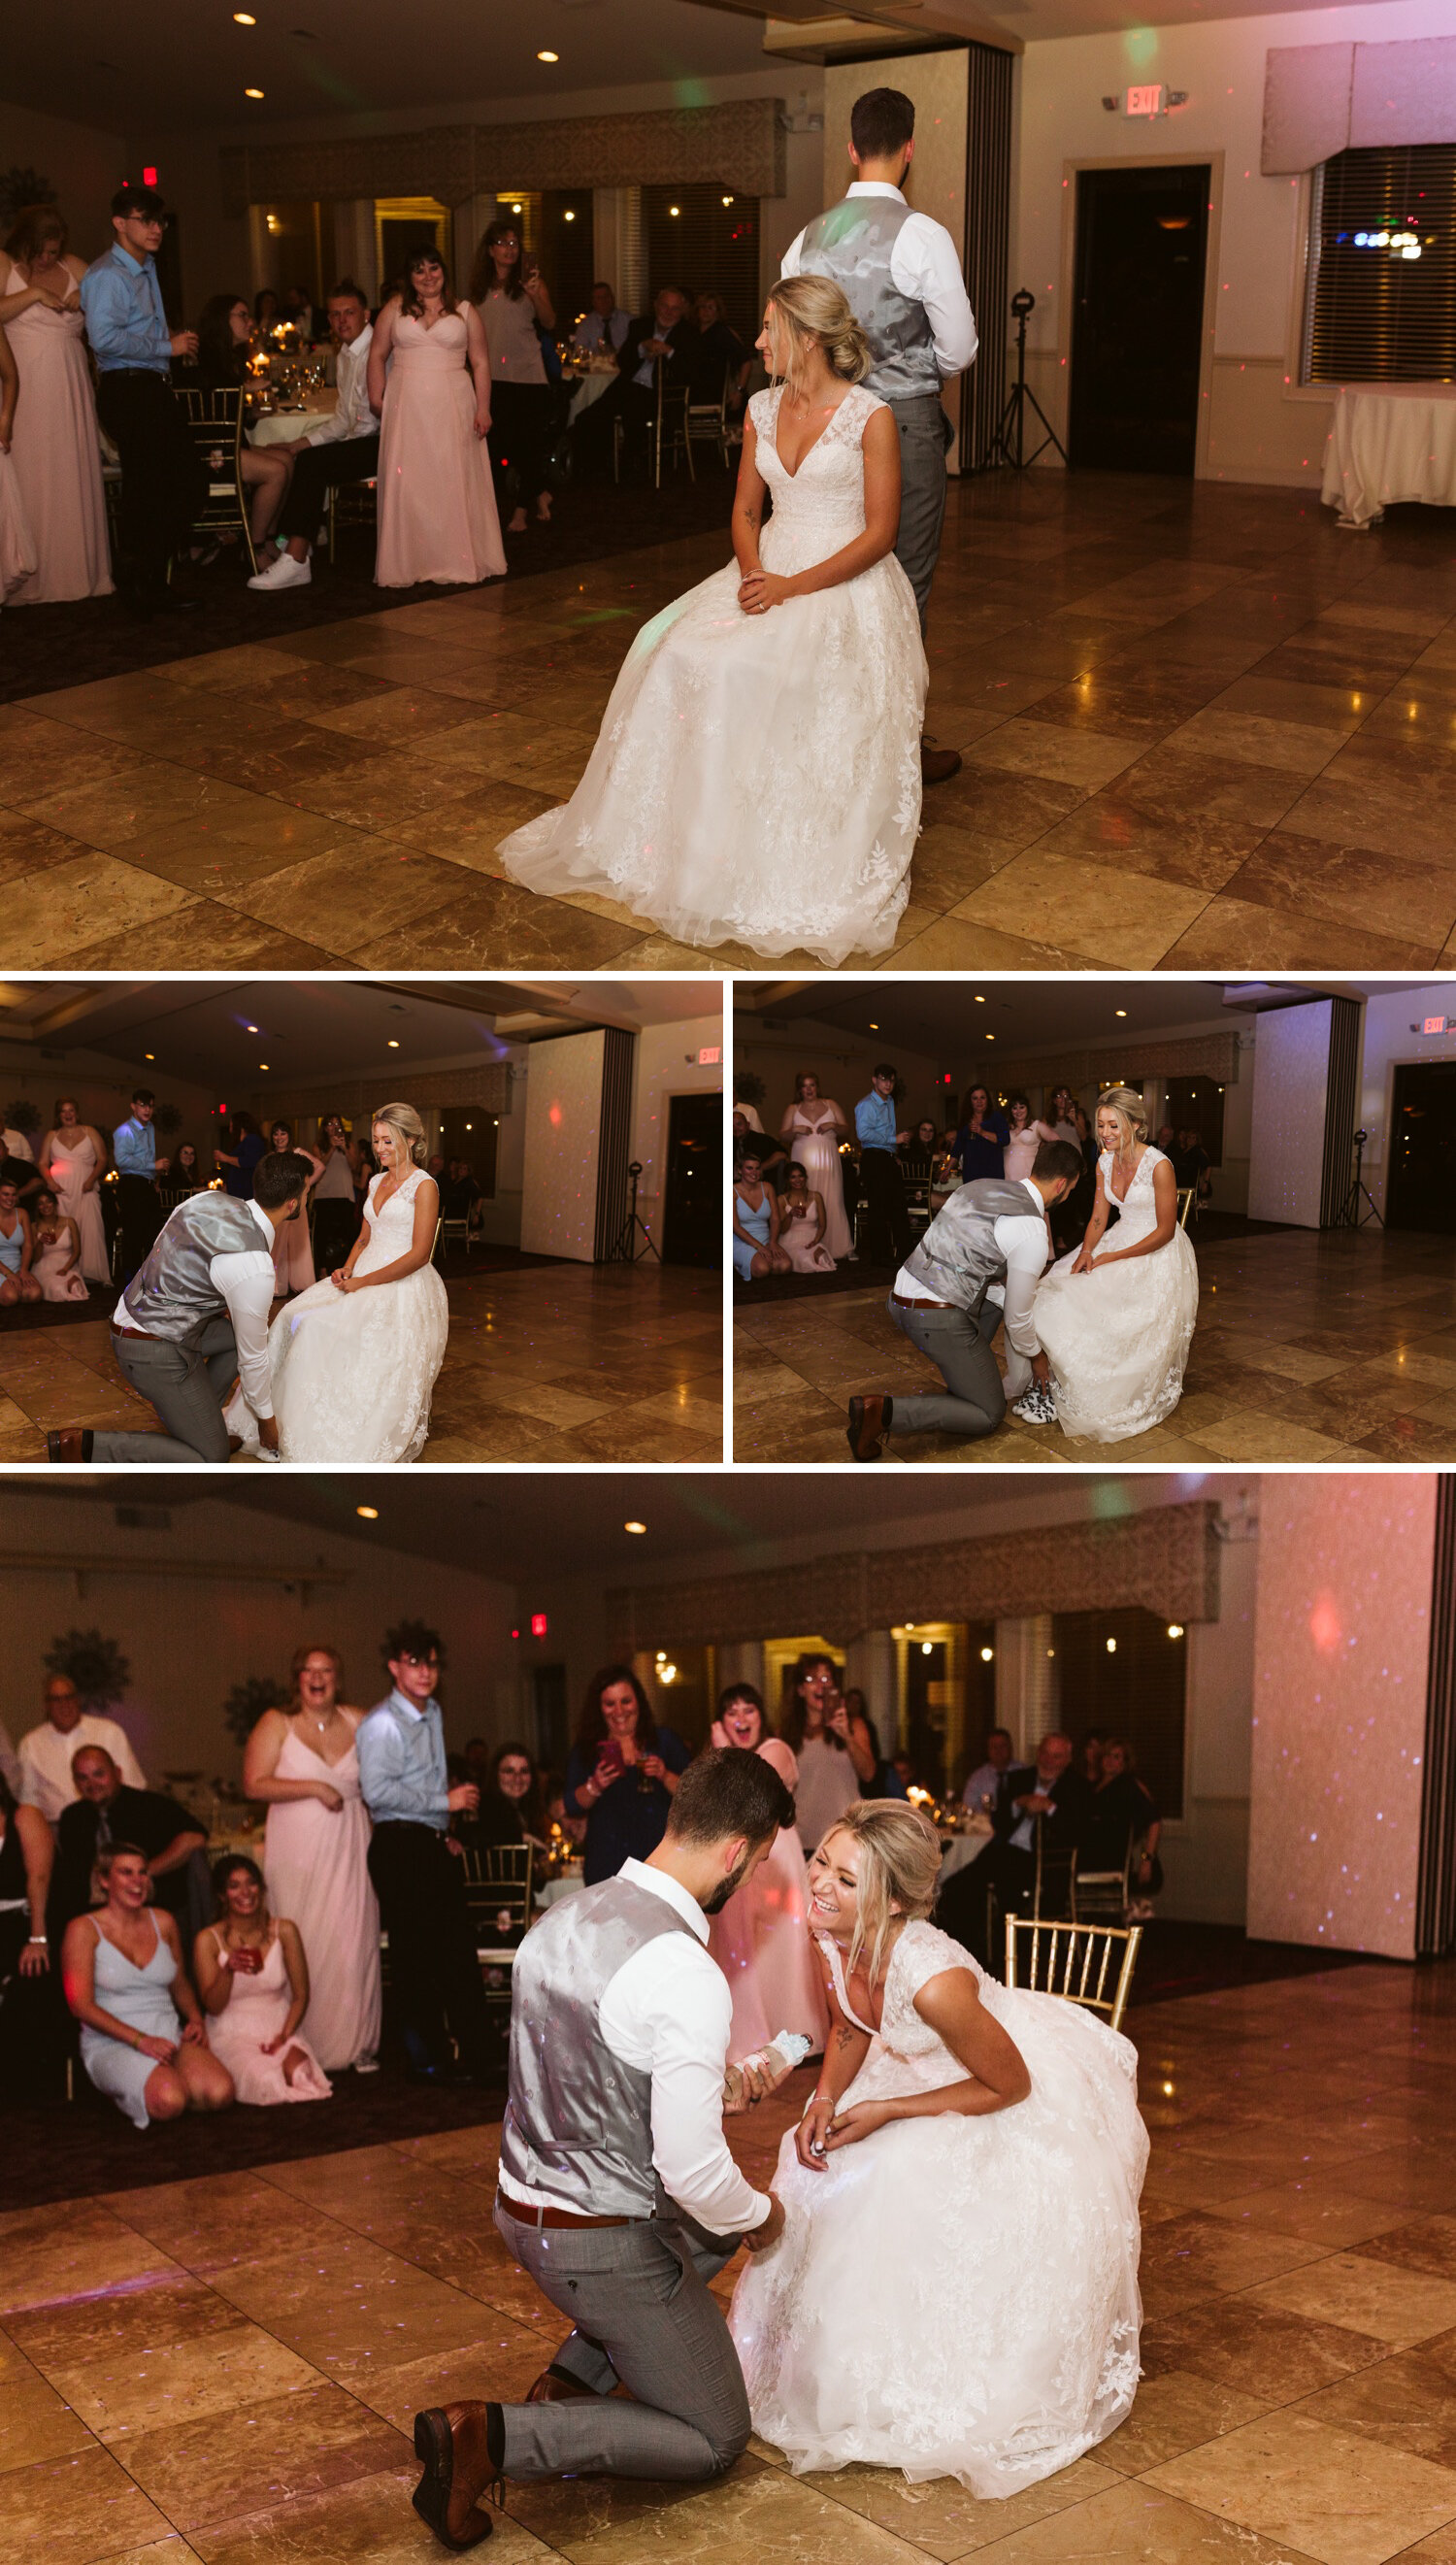 Wedding reception procession photos